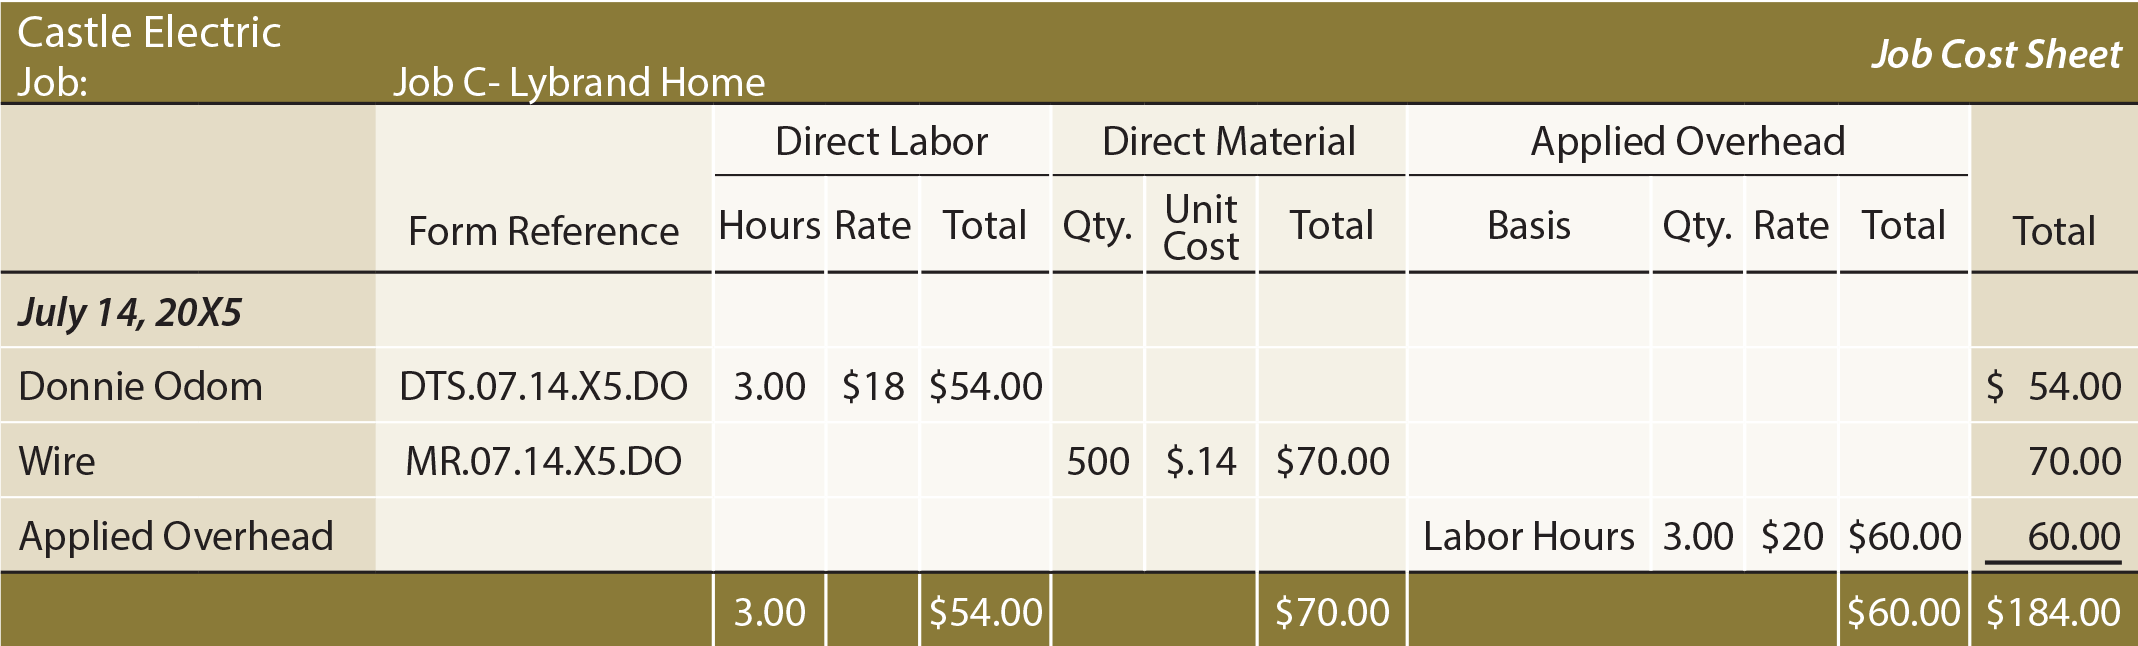 Job Costing Sheet - Job C